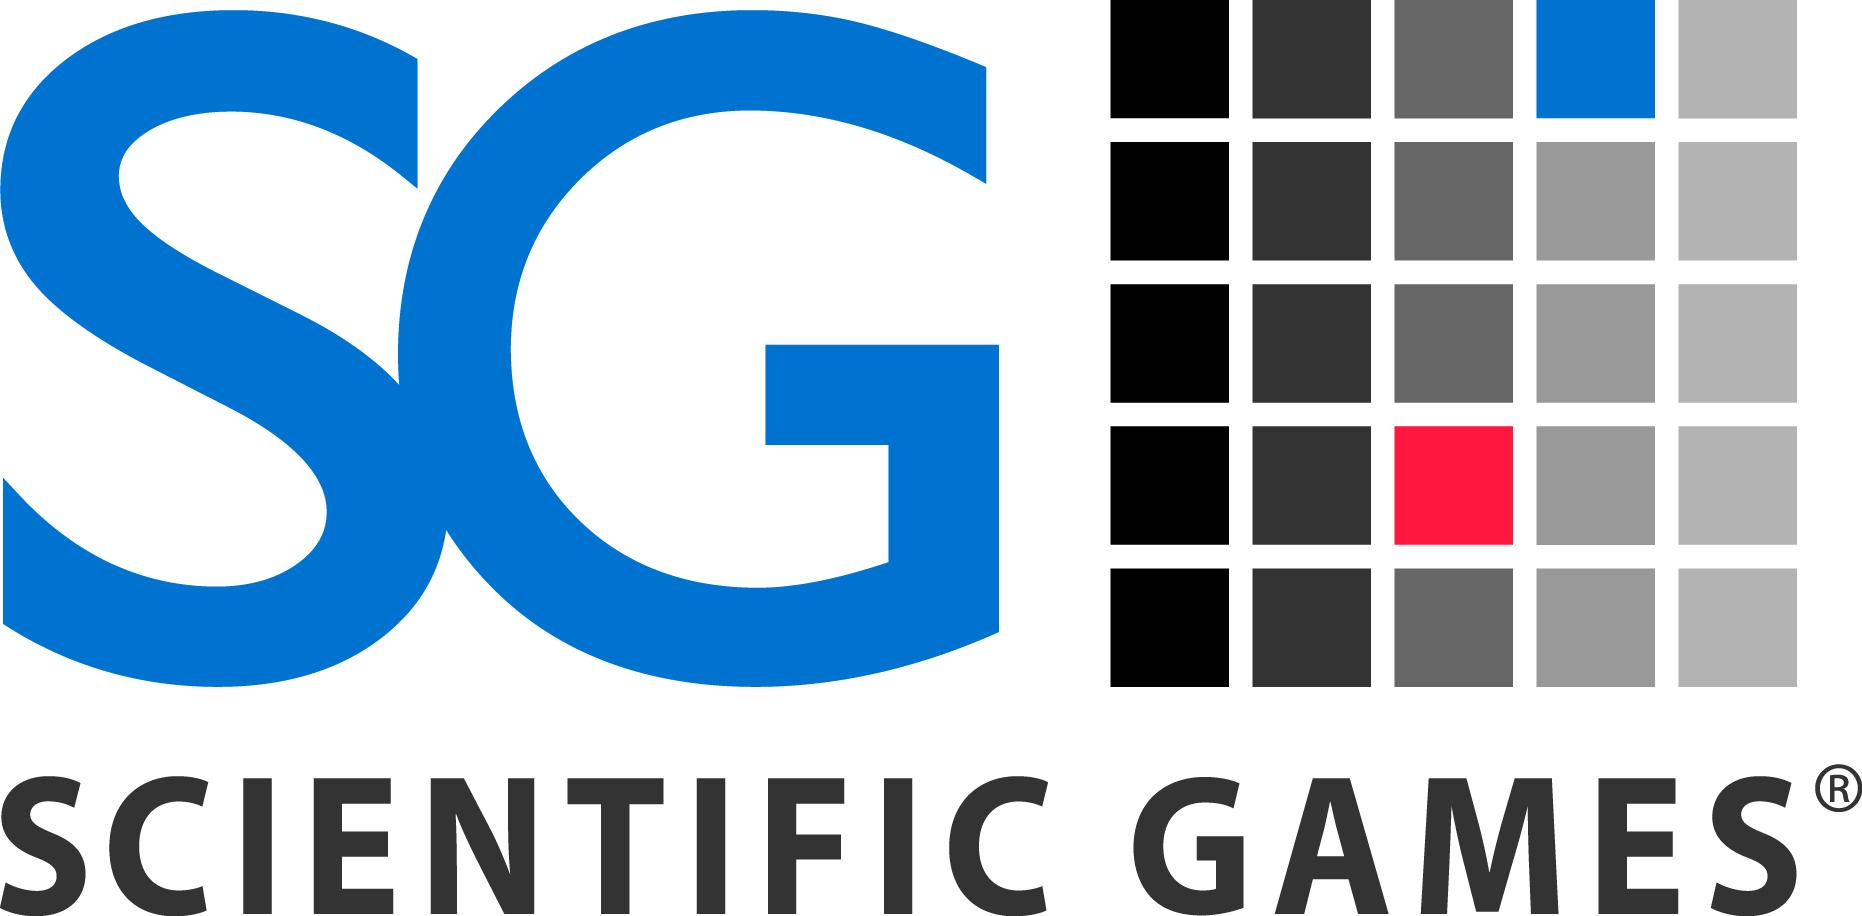 Sg Games